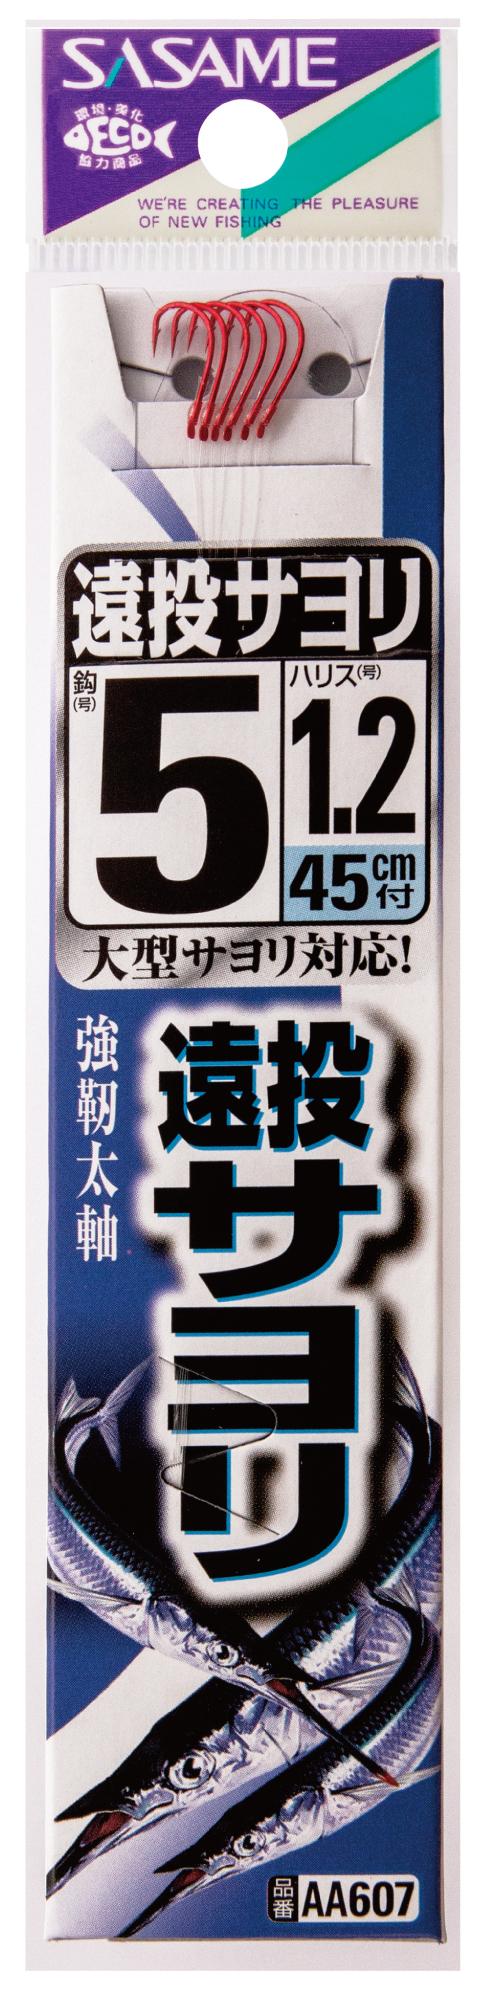 AA607